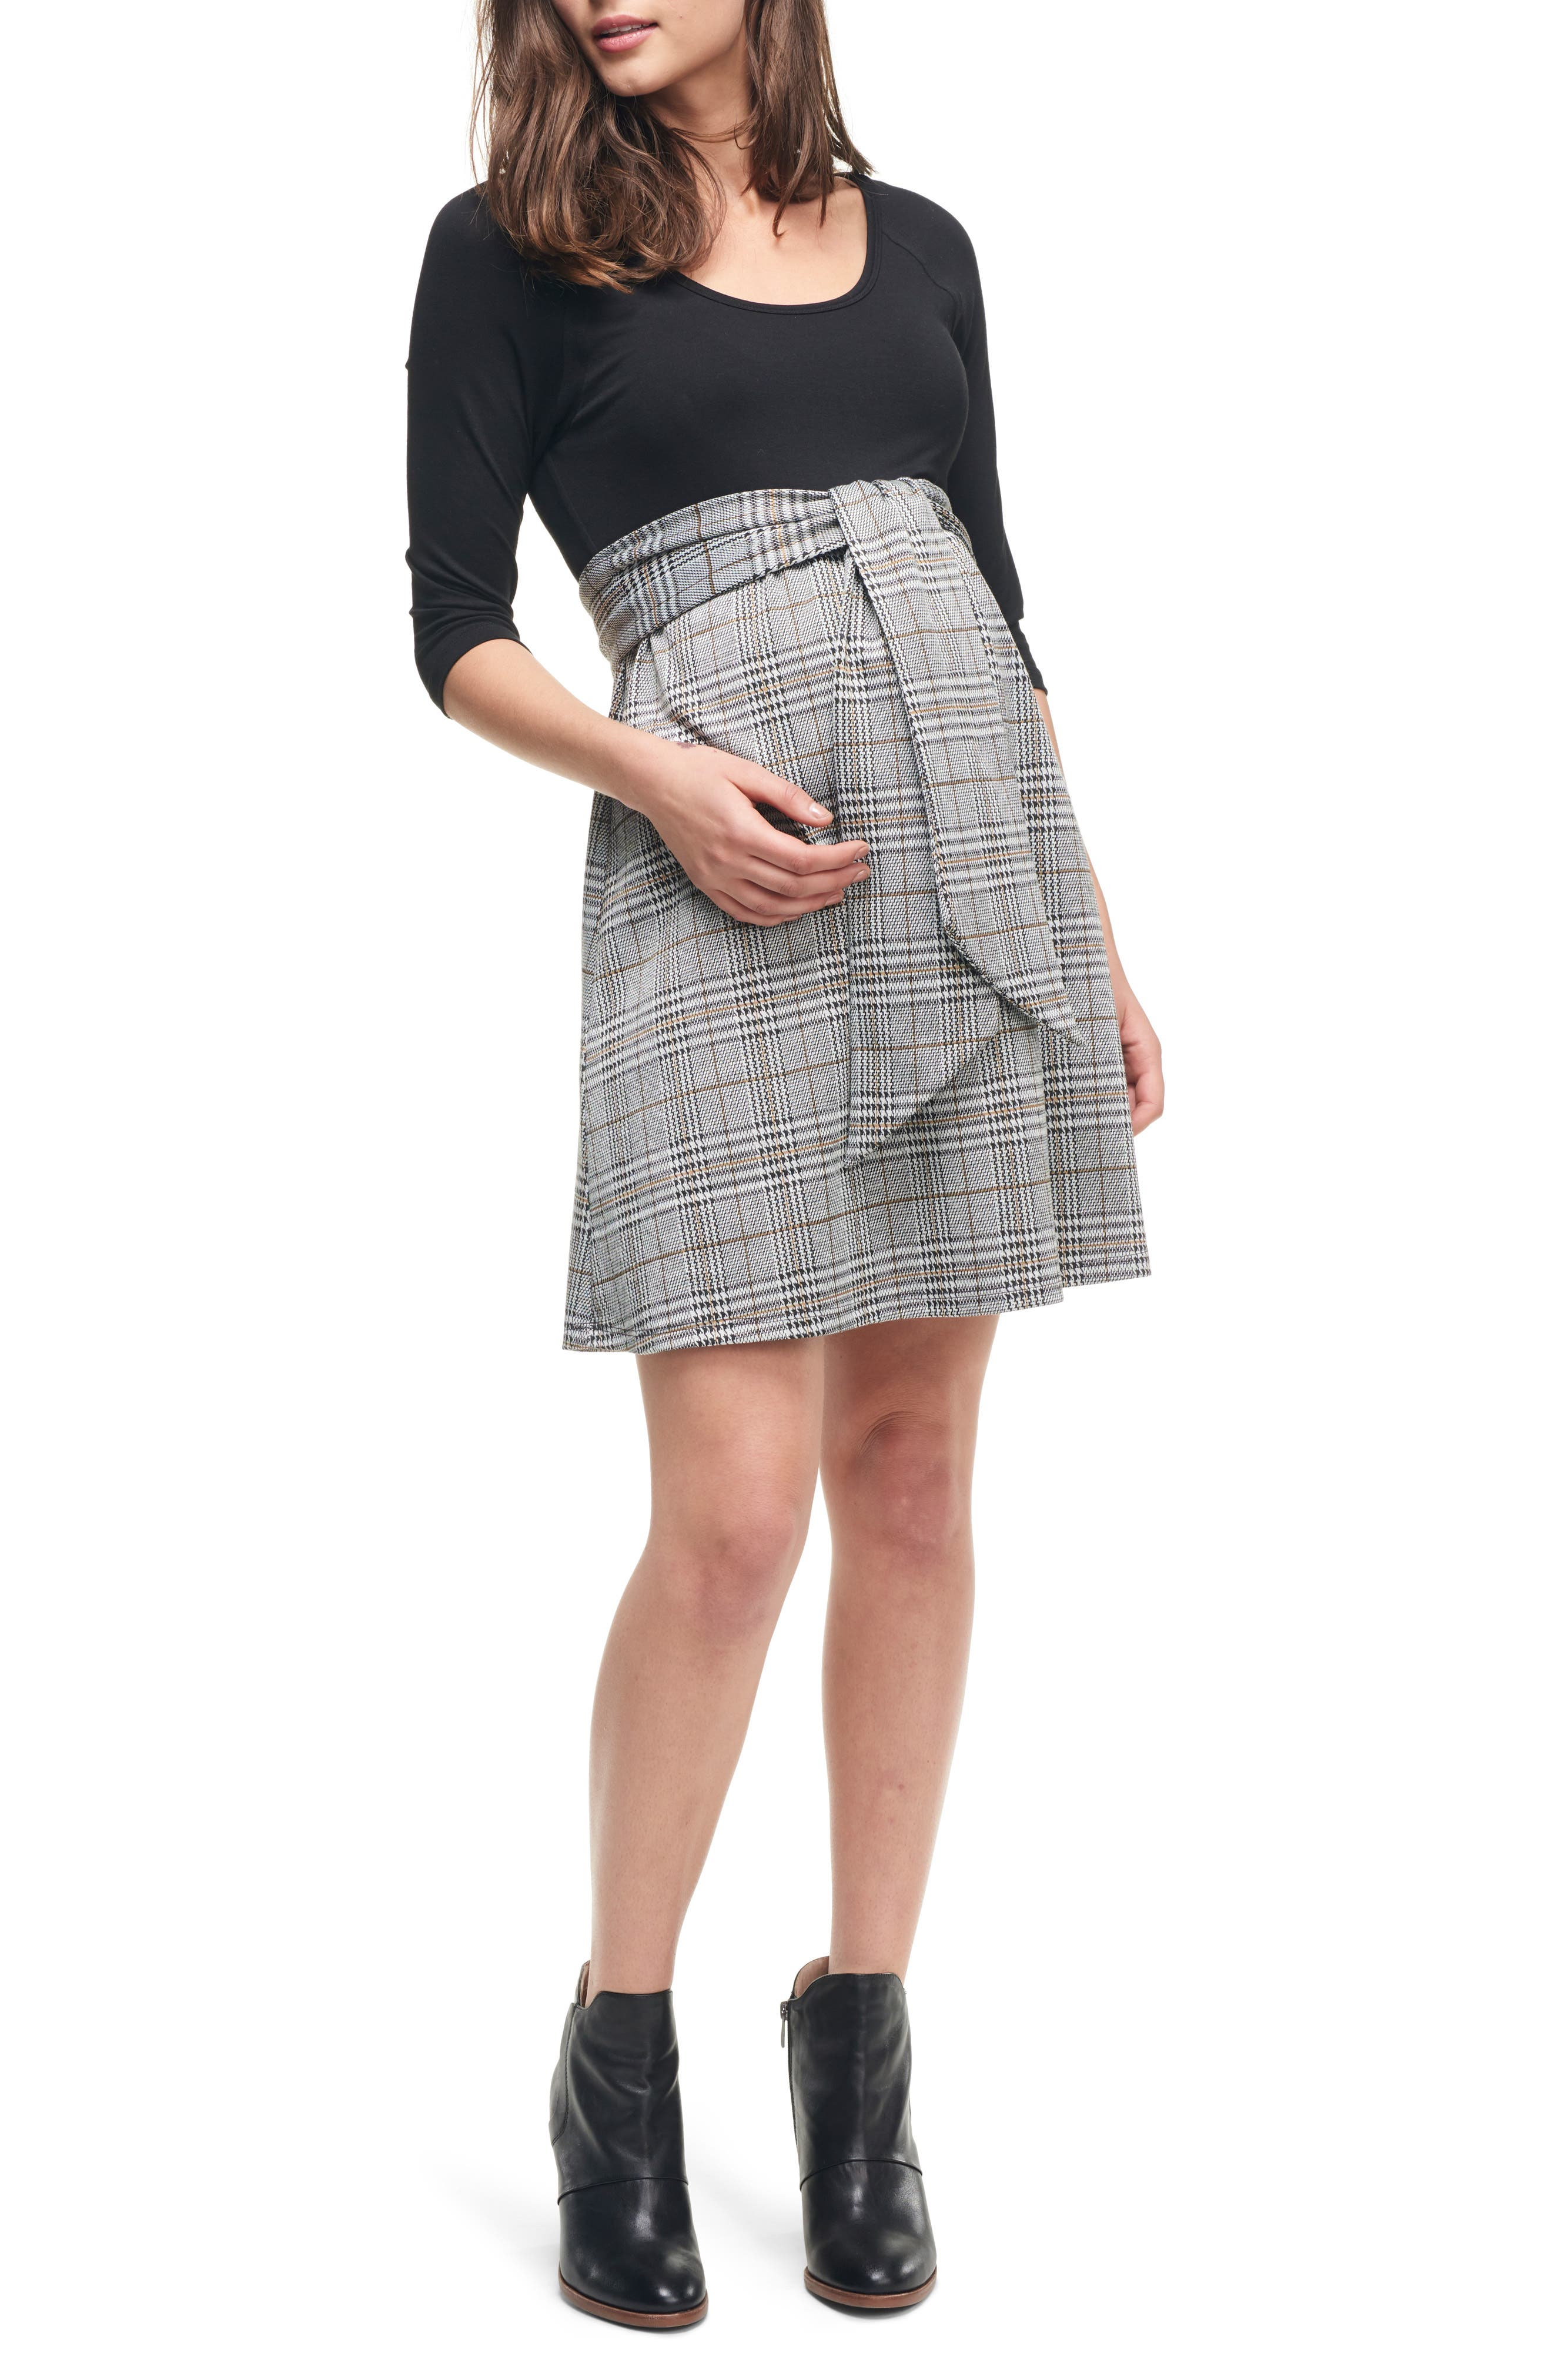 MATERNAL AMERICA Scoop Neck Maternity Dress, Main, color, BLACK/ PLAID